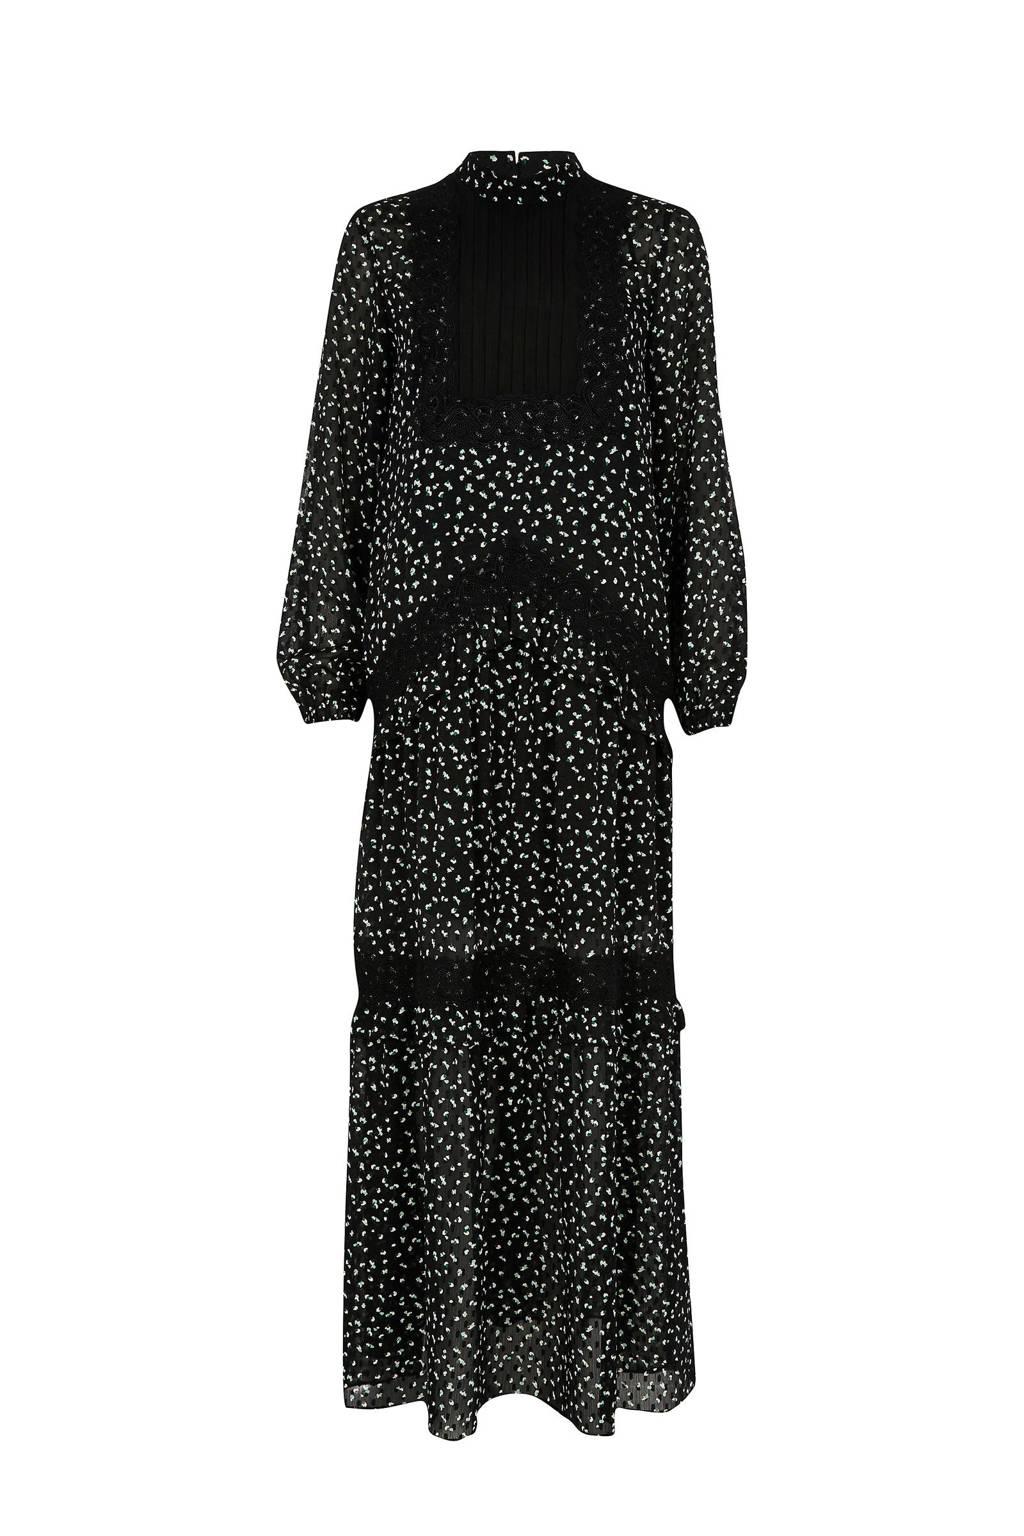 River Island jurk met print, Zwart/wit